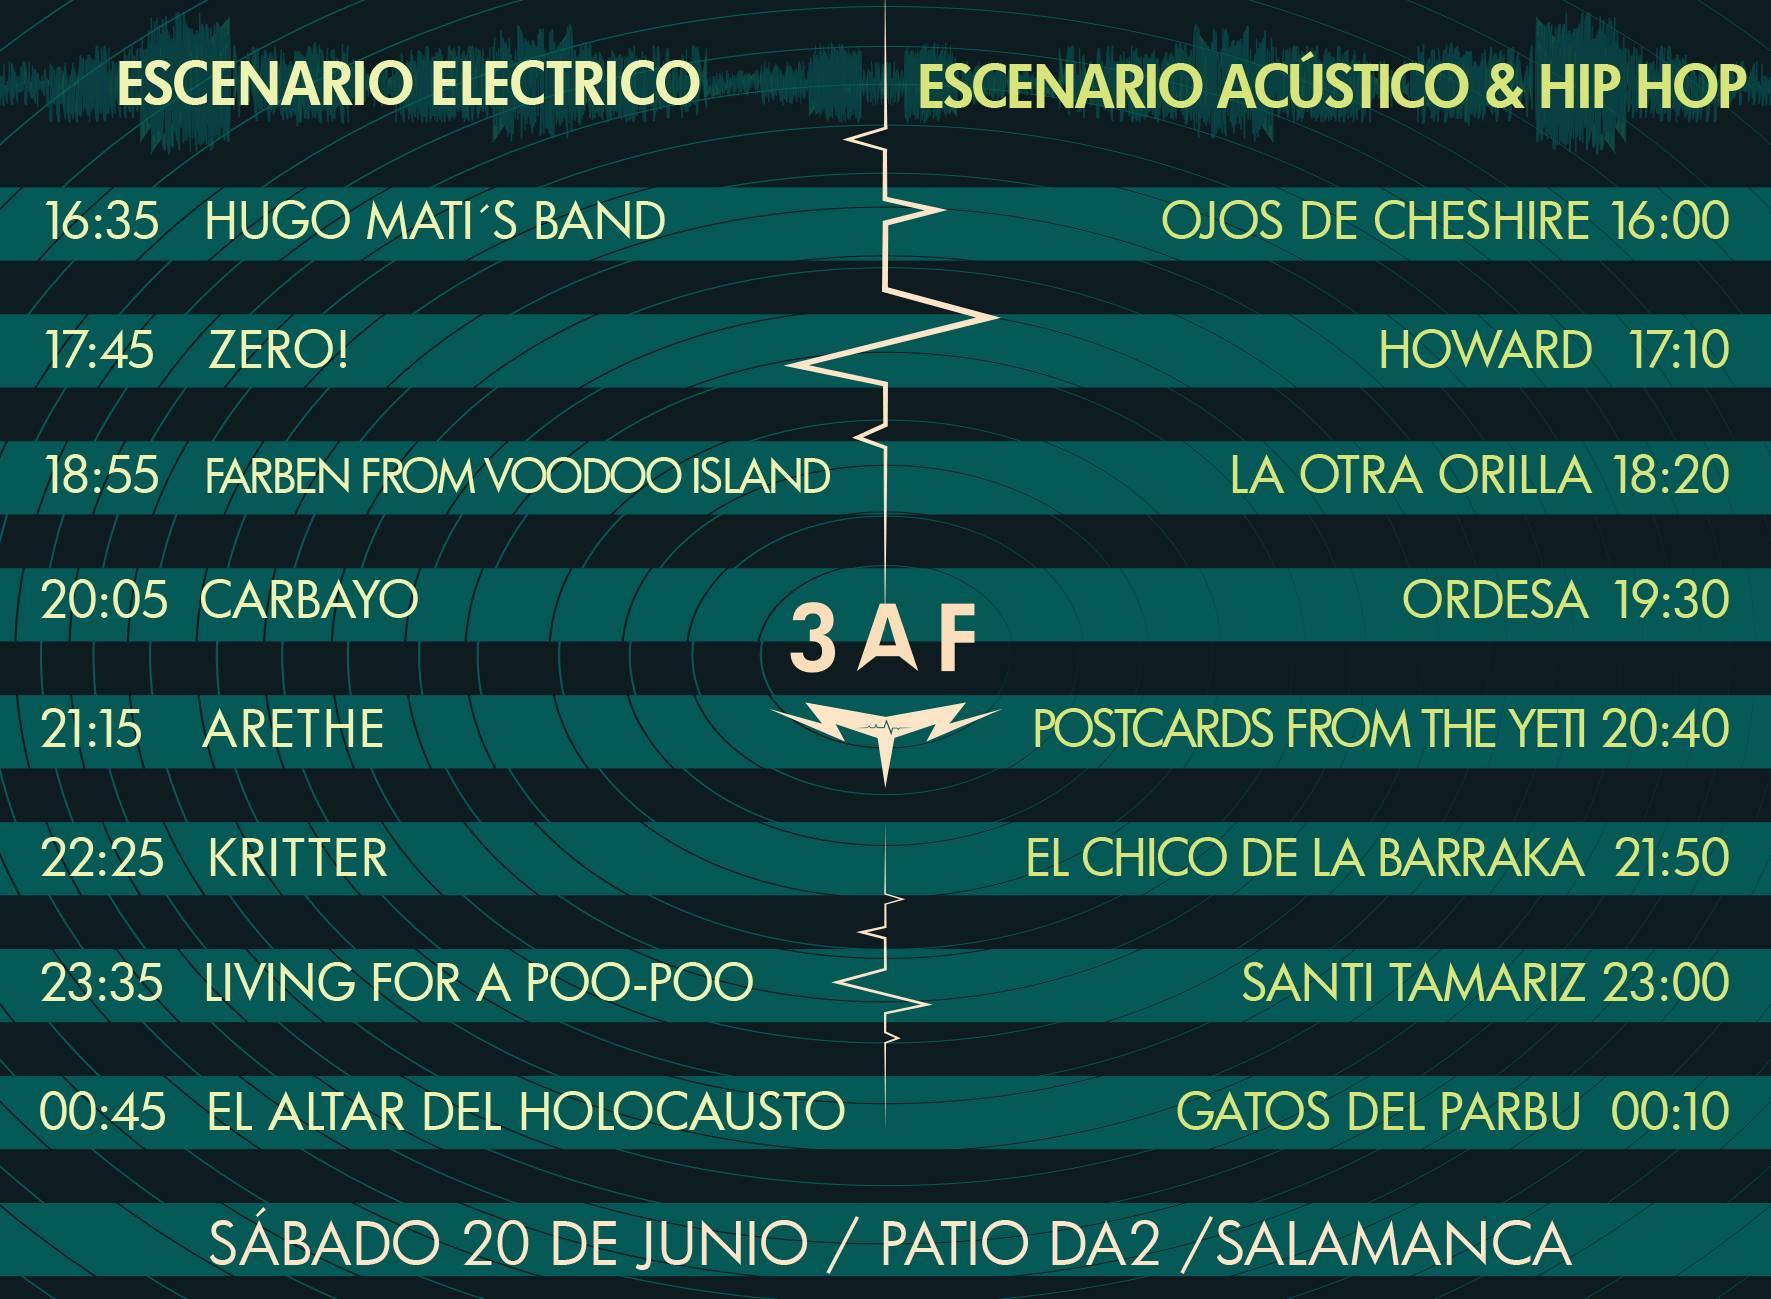 horarios_tresacordesfest2015